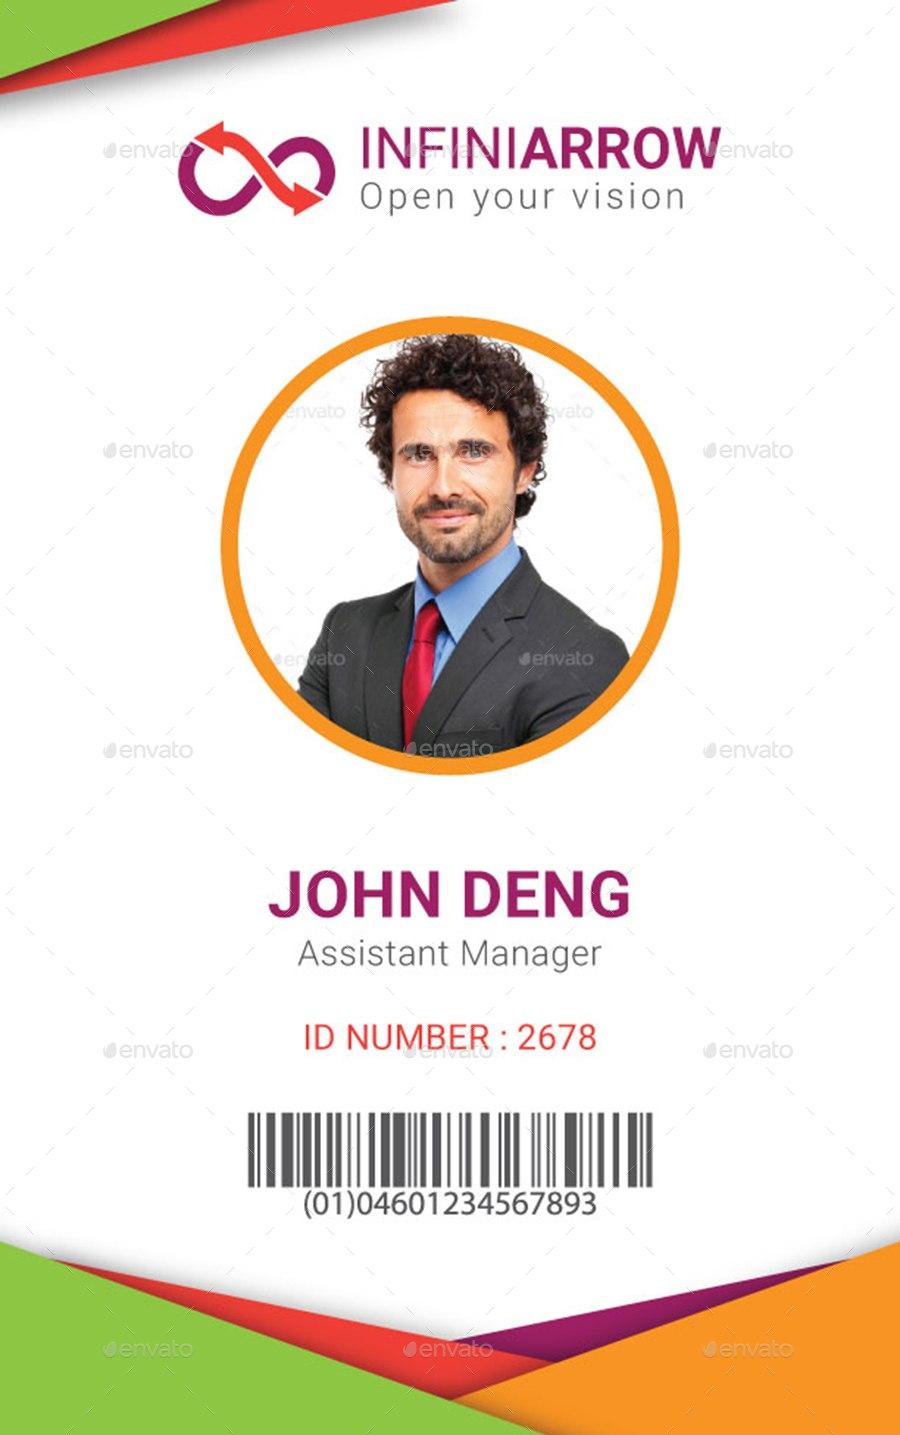 Multipurpose Business Id Card Templatedotnpix  Graphicriver Throughout Media Id Card Templates